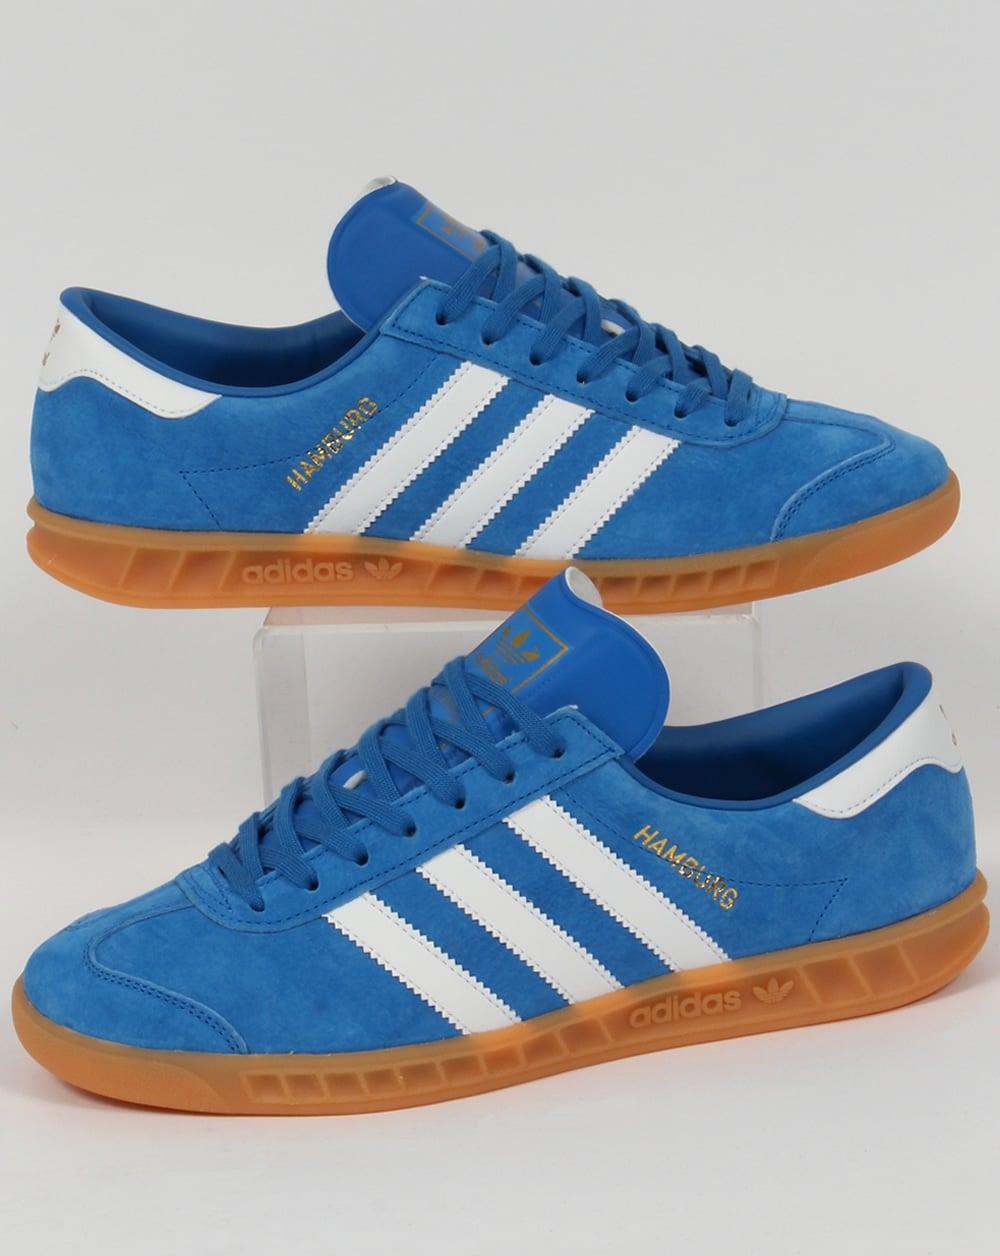 Adidas Trainers Adidas Hamburg Trainers Bluebird Blue/White